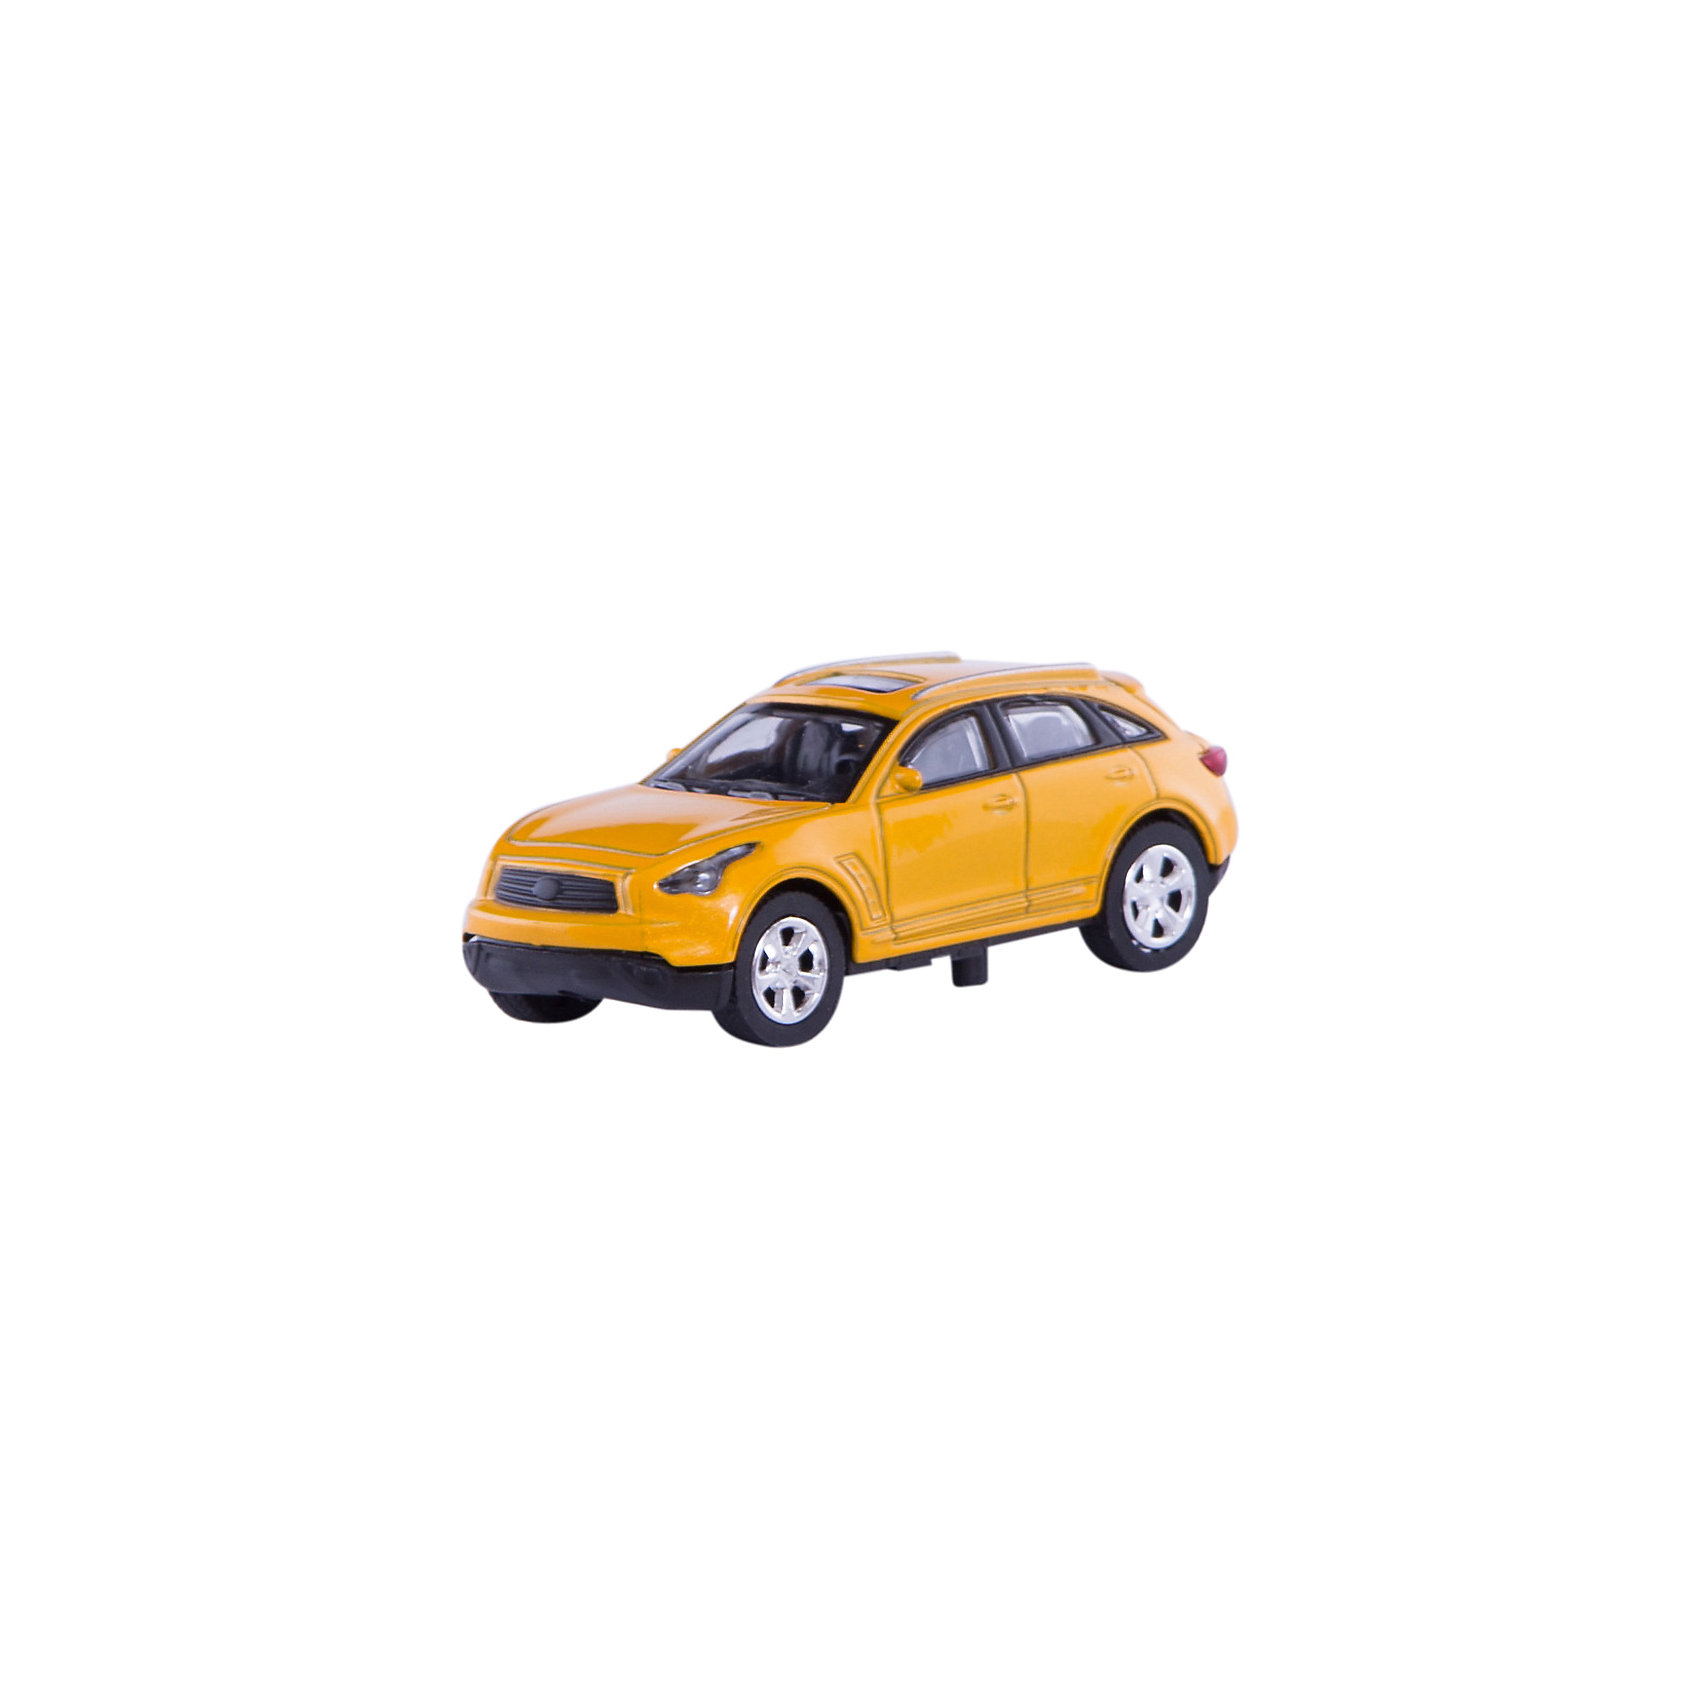 Машинка Japan Premium Suv со светом фар 1:43, AutotimeМашинки<br><br><br>Ширина мм: 165<br>Глубина мм: 57<br>Высота мм: 75<br>Вес г: 13<br>Возраст от месяцев: 36<br>Возраст до месяцев: 2147483647<br>Пол: Мужской<br>Возраст: Детский<br>SKU: 5584038